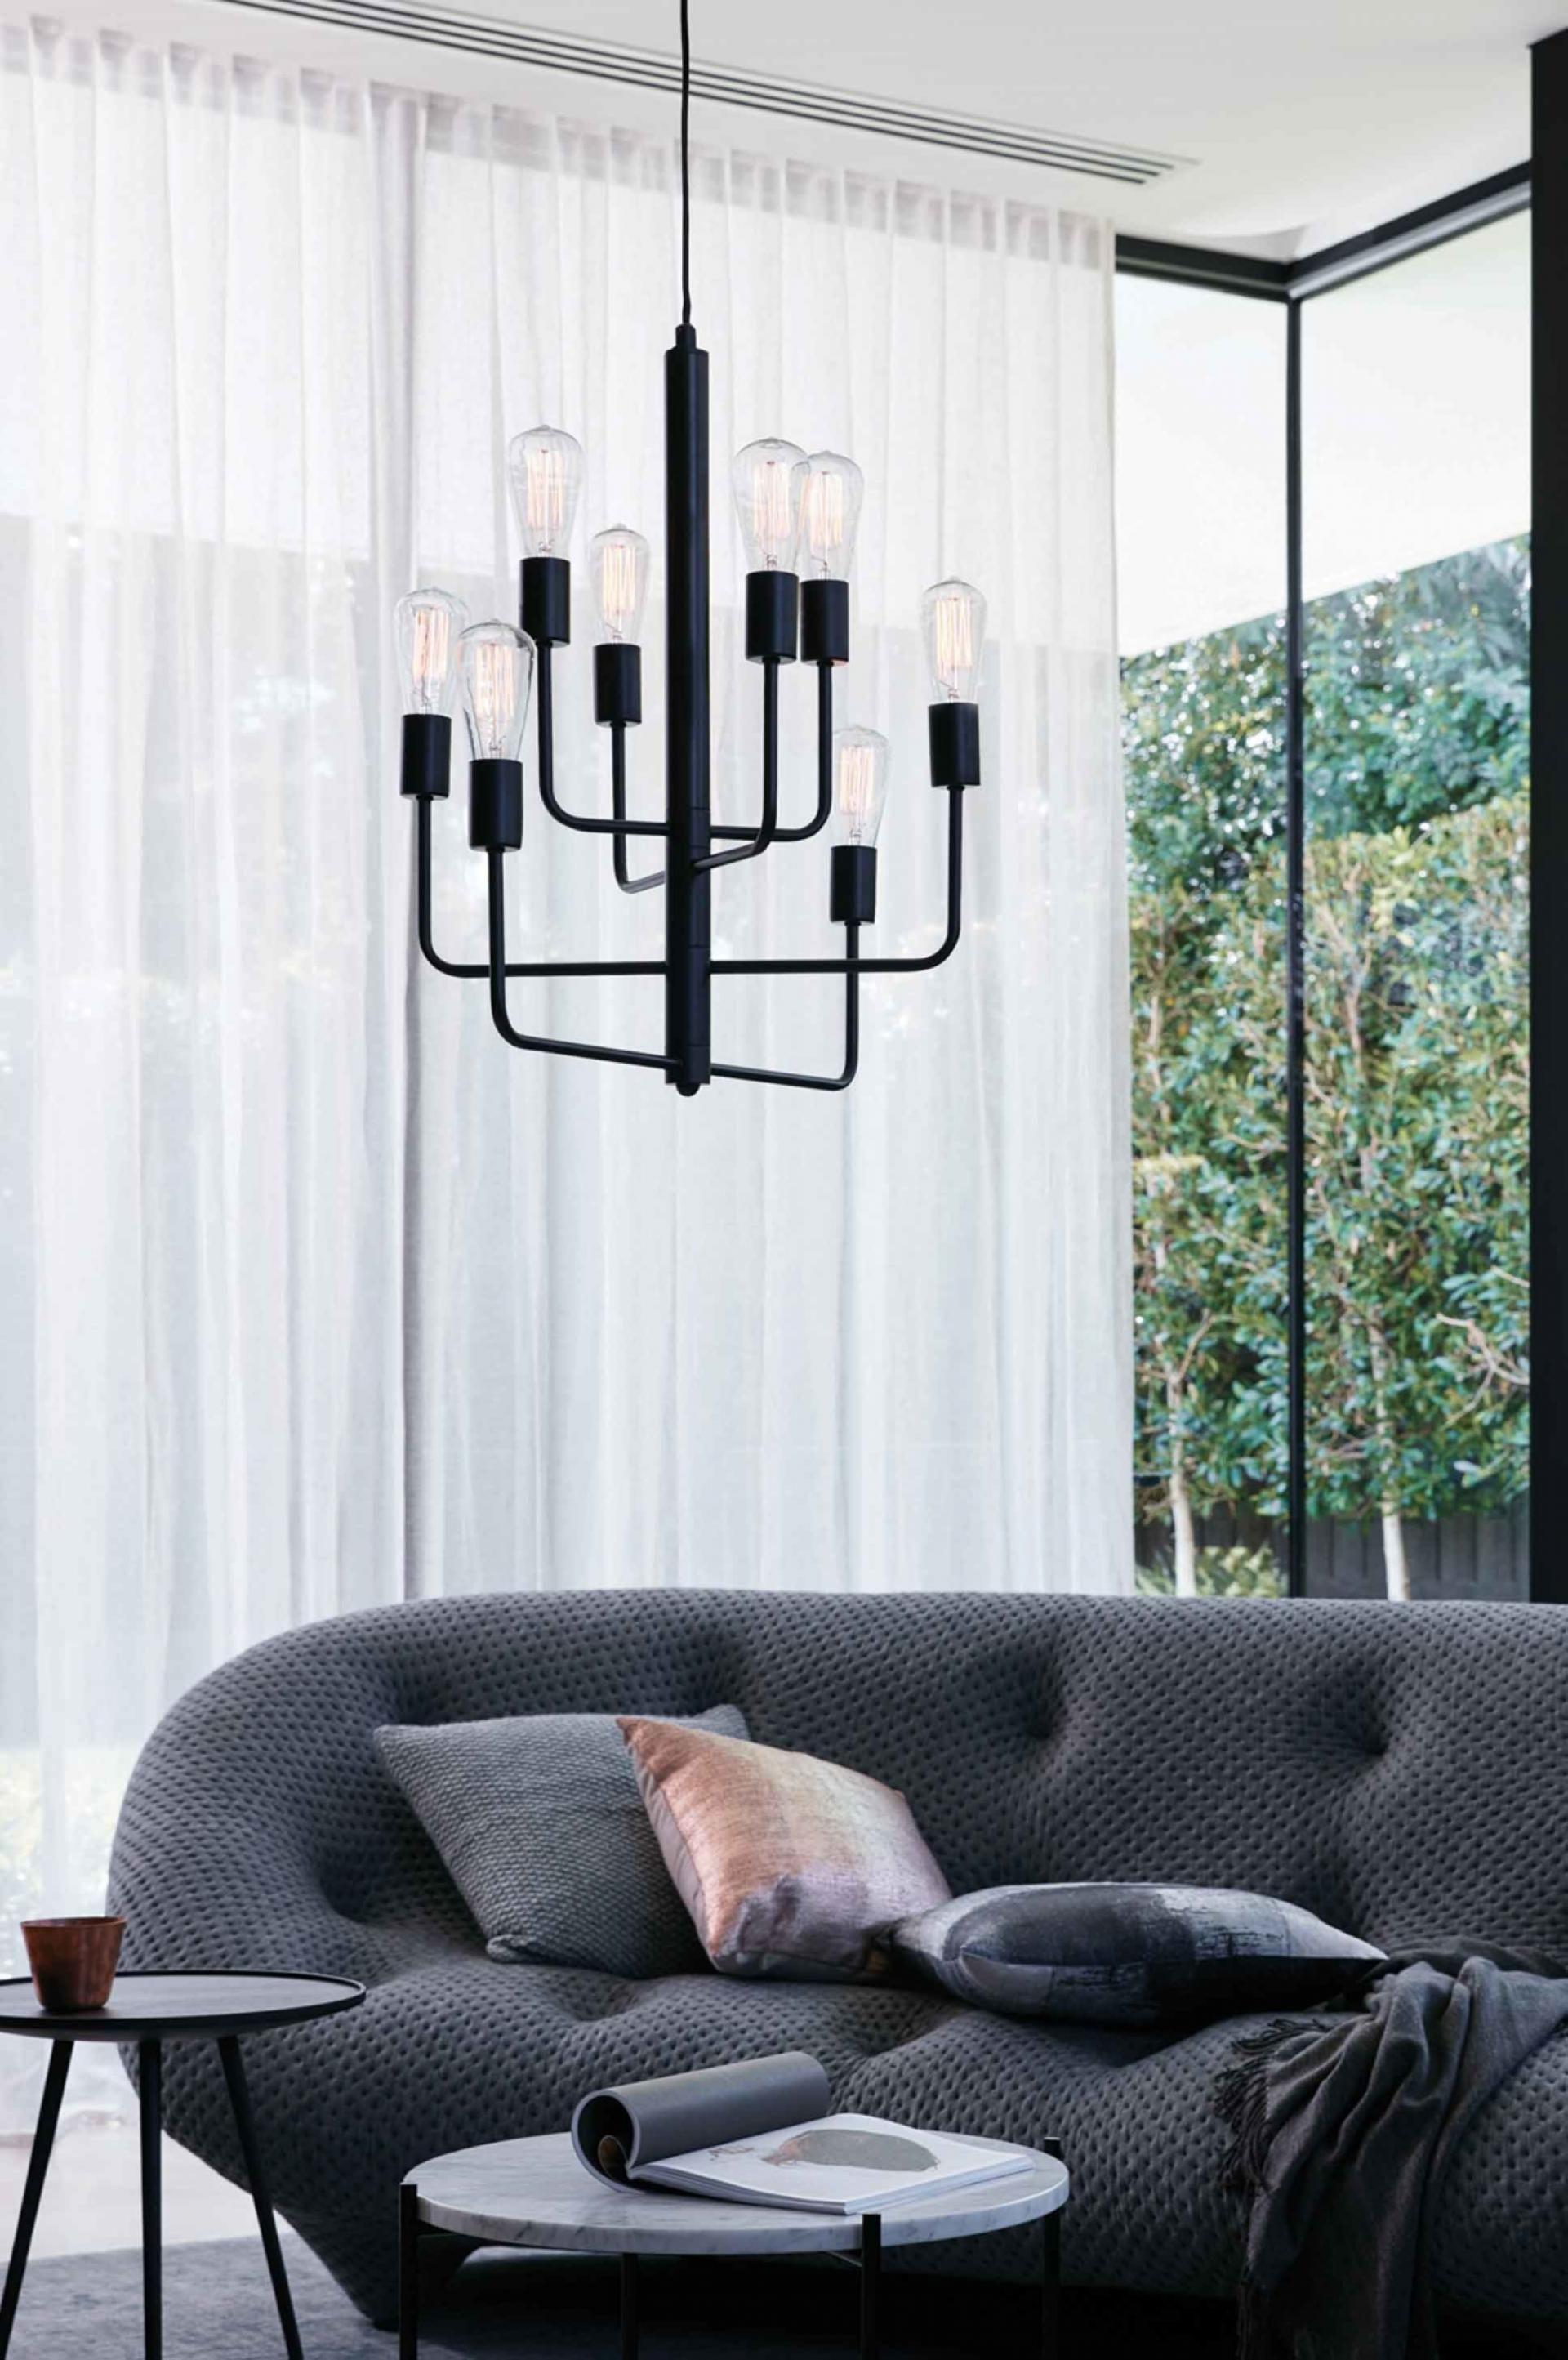 Pendant Lights That Ll Upgrade Your Space Instantly Modern Bedroom Lighting Beacon Lighting Pendant Lighting